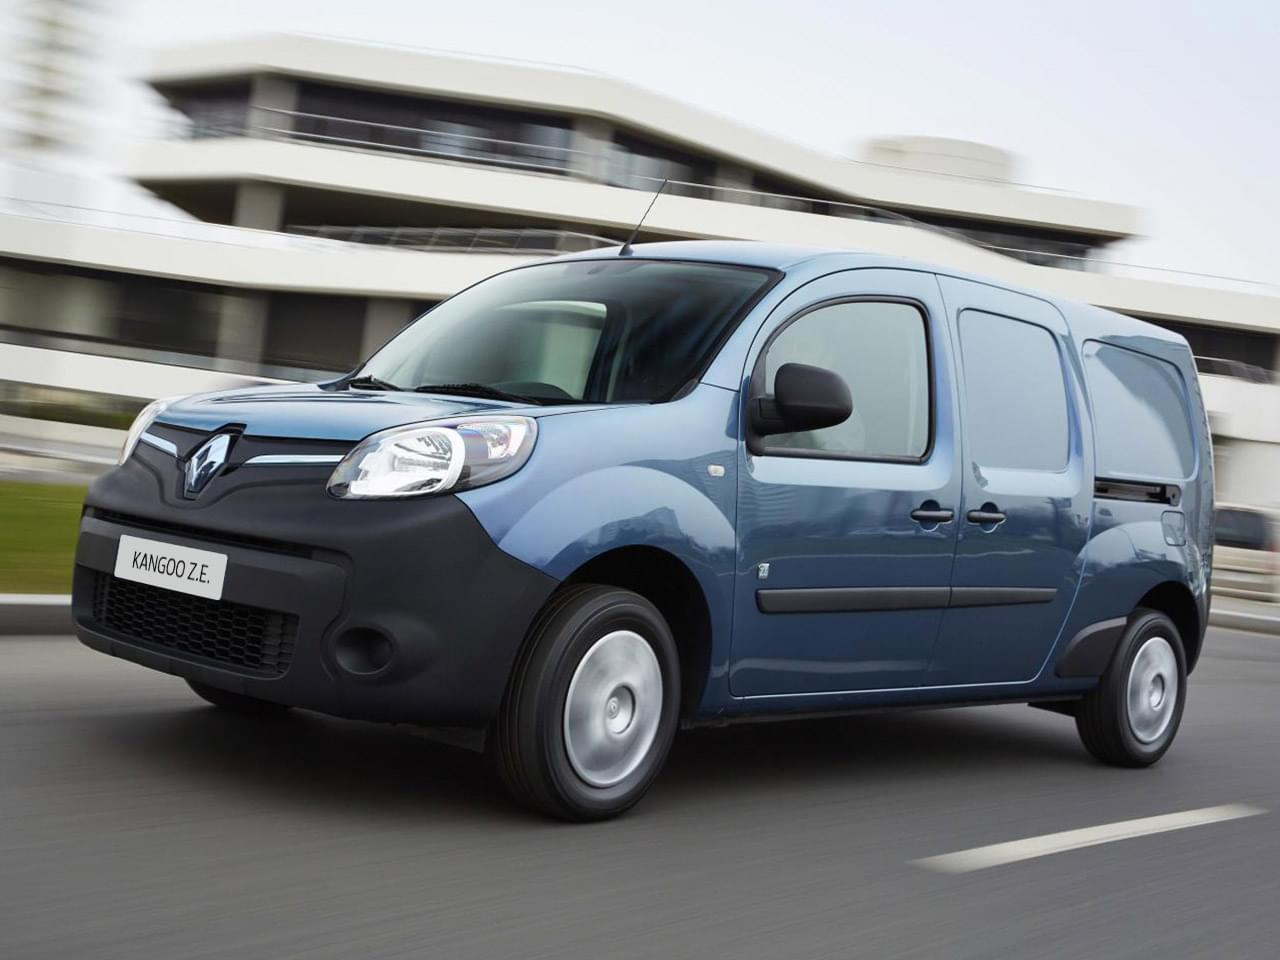 Renault Kangoo Z.E. 2-Sitzer LKW Batteriemiete Z.E. Flex 33/40 monatlich 66€**